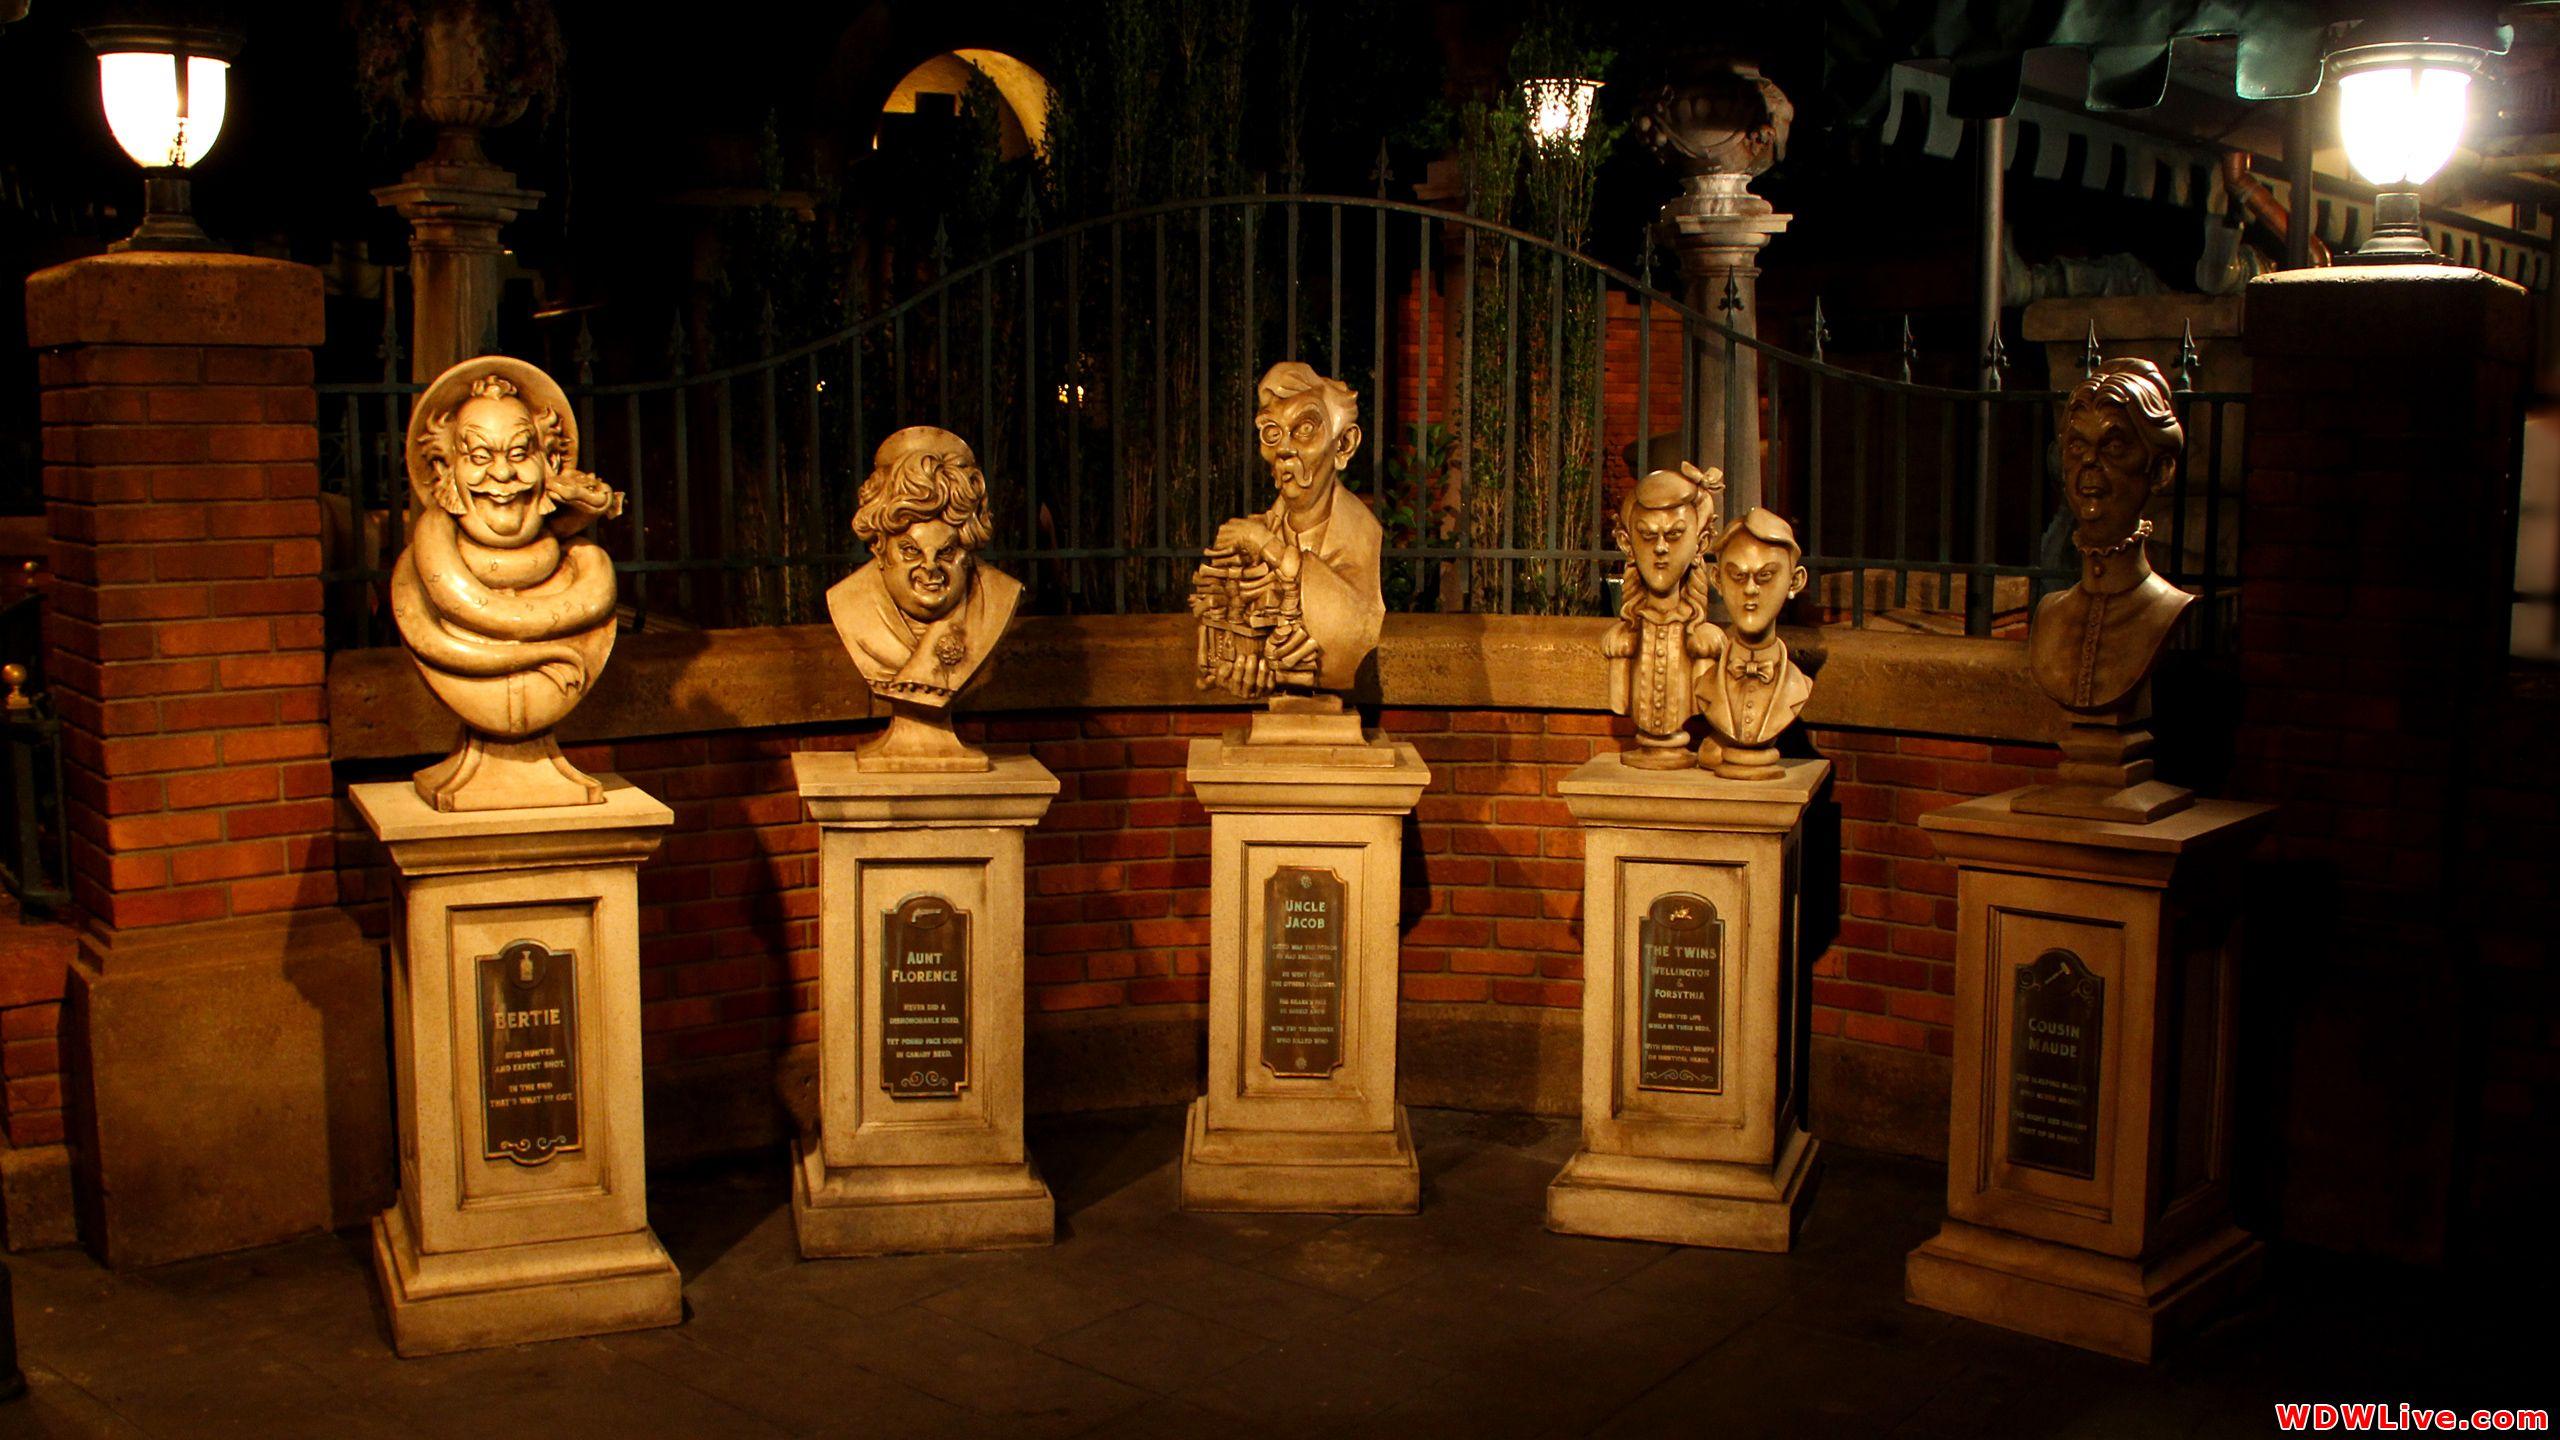 The Haunted Mansion Desktop Wallpaper Haunted Mansion Wallpaper Disney Haunted Mansion Disney World Rides